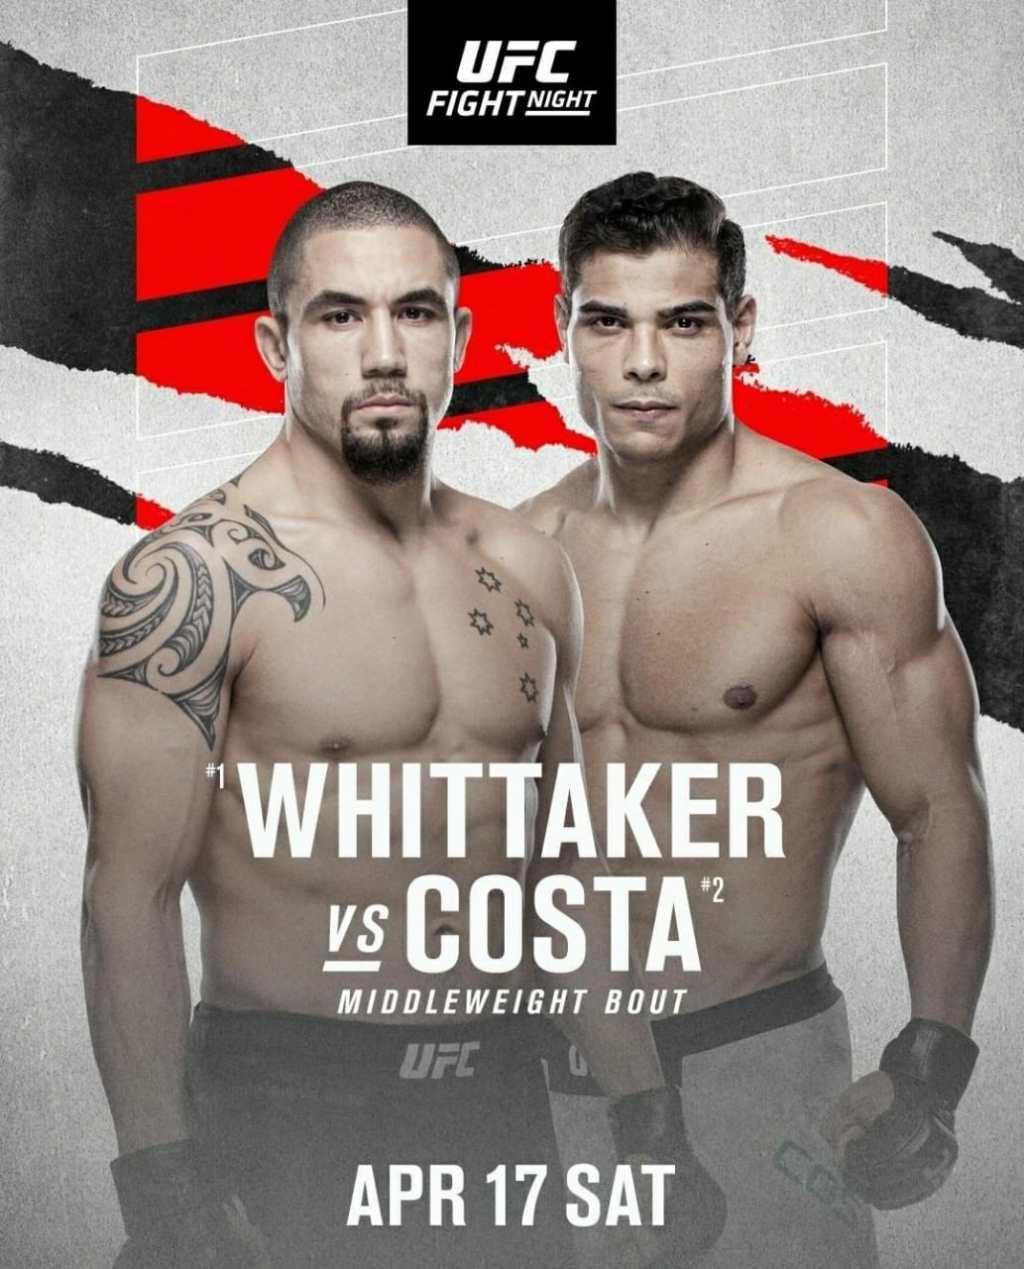 UFC Fight Night Schedule 2021 | Ultimate Fighting Championship Whittaker vs Costa